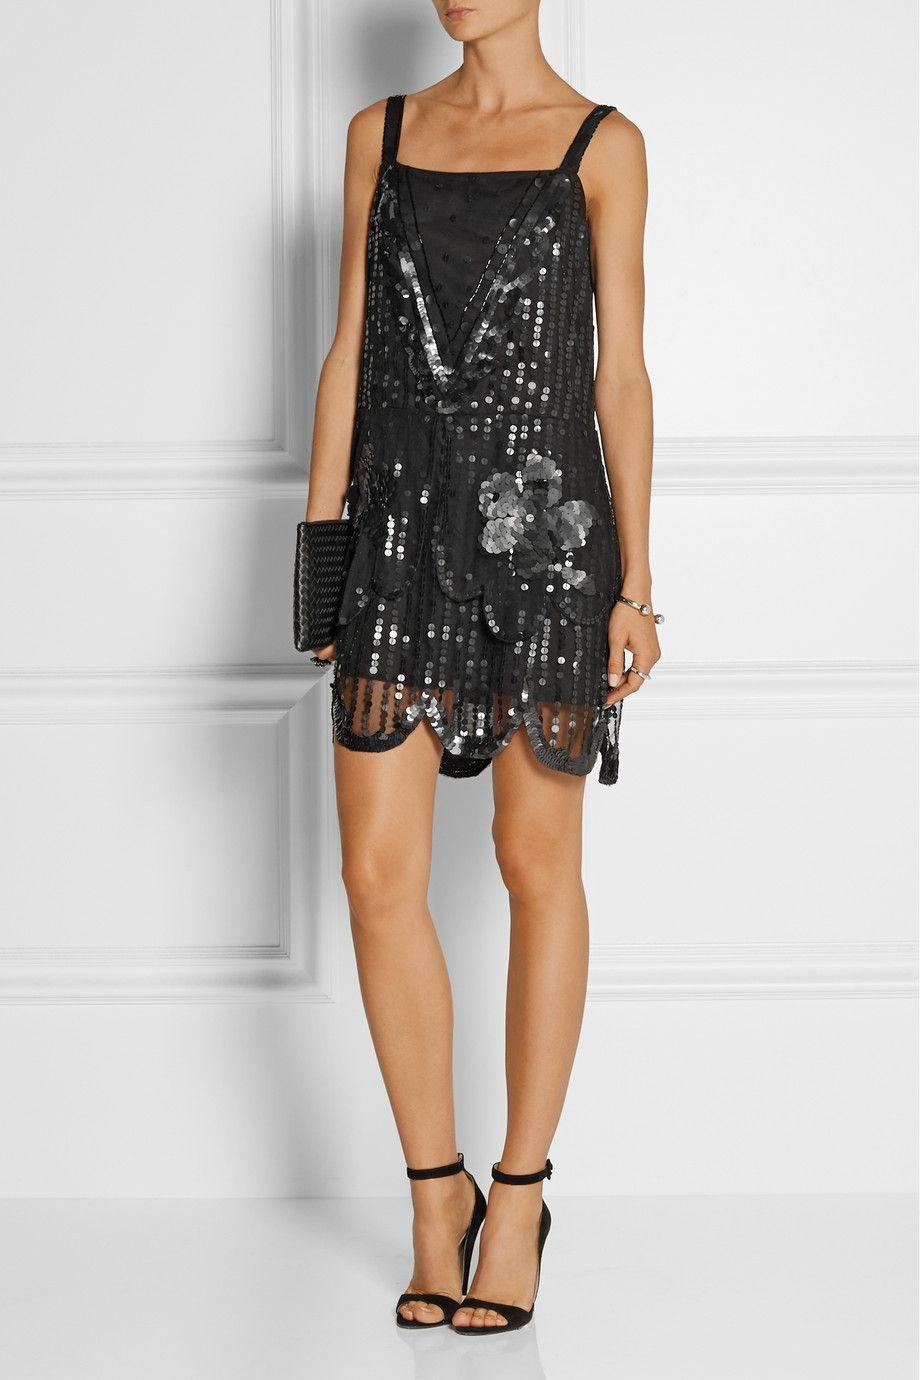 Anna Sui|Sequin-embellished tulle dress|NET-A-PORTER.COM